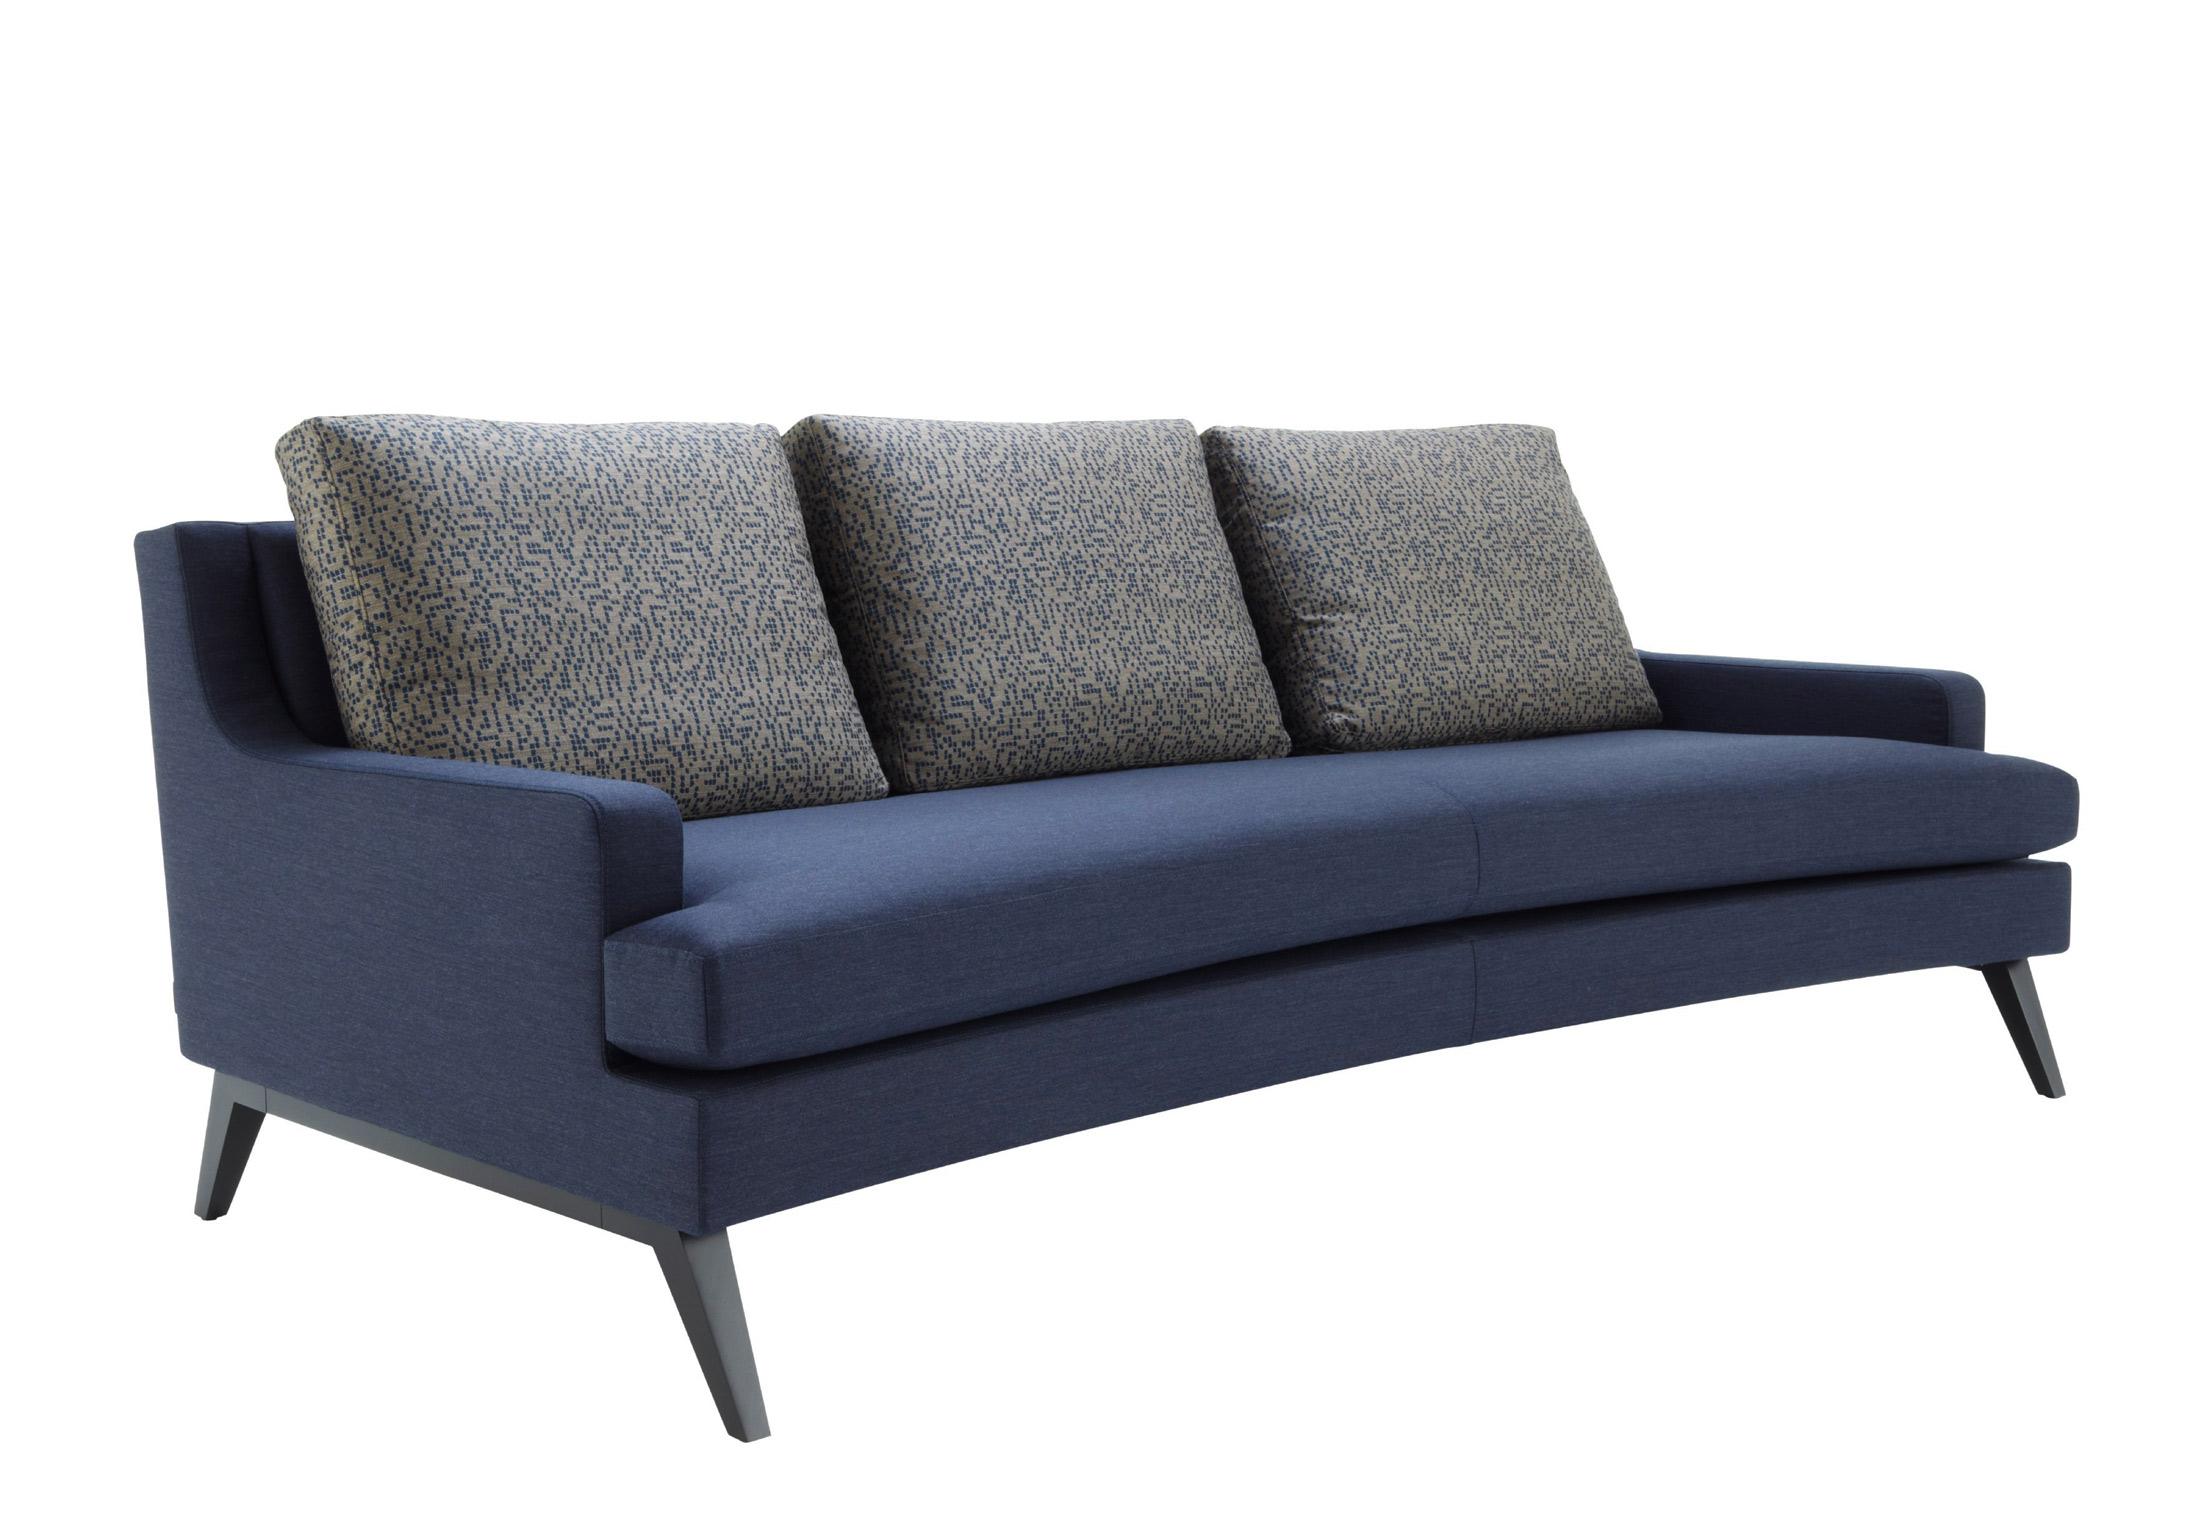 Belem 3 Seater By Ligne Roset Stylepark # Gebrauchte Muebles